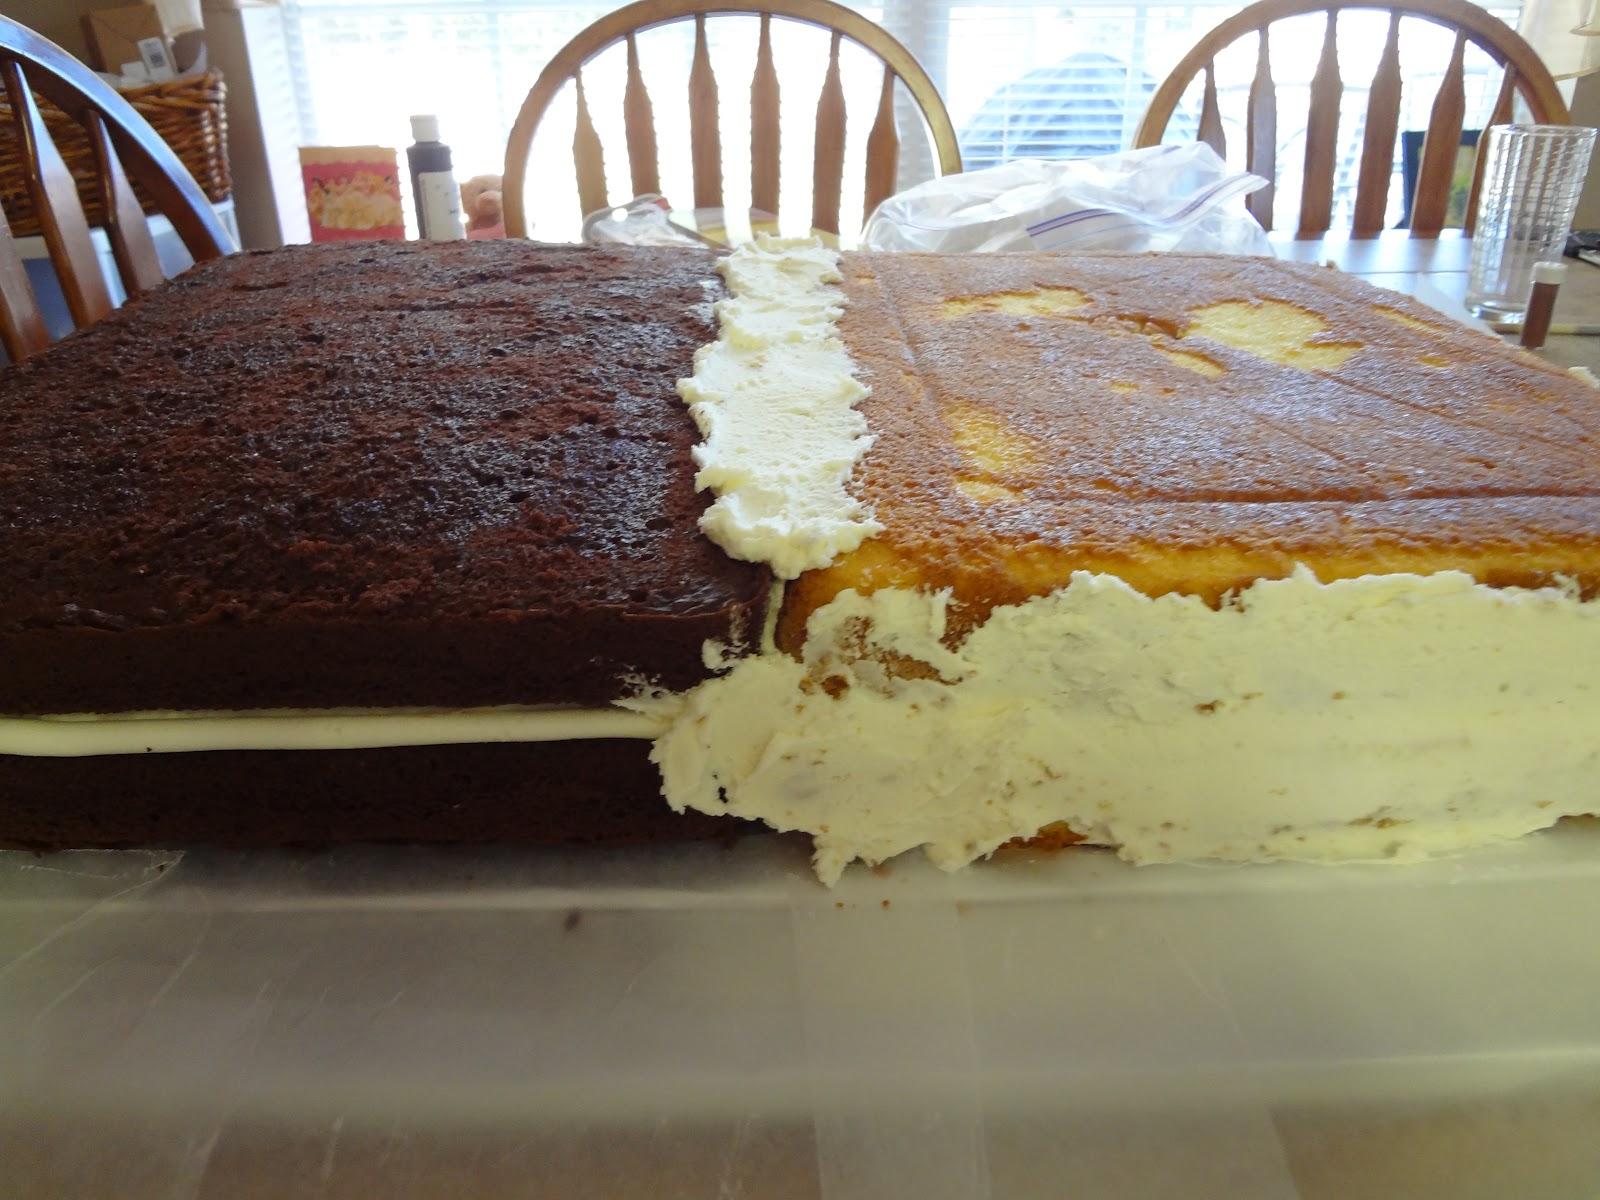 The Gluten Free Wife Eagle Birthday Cake